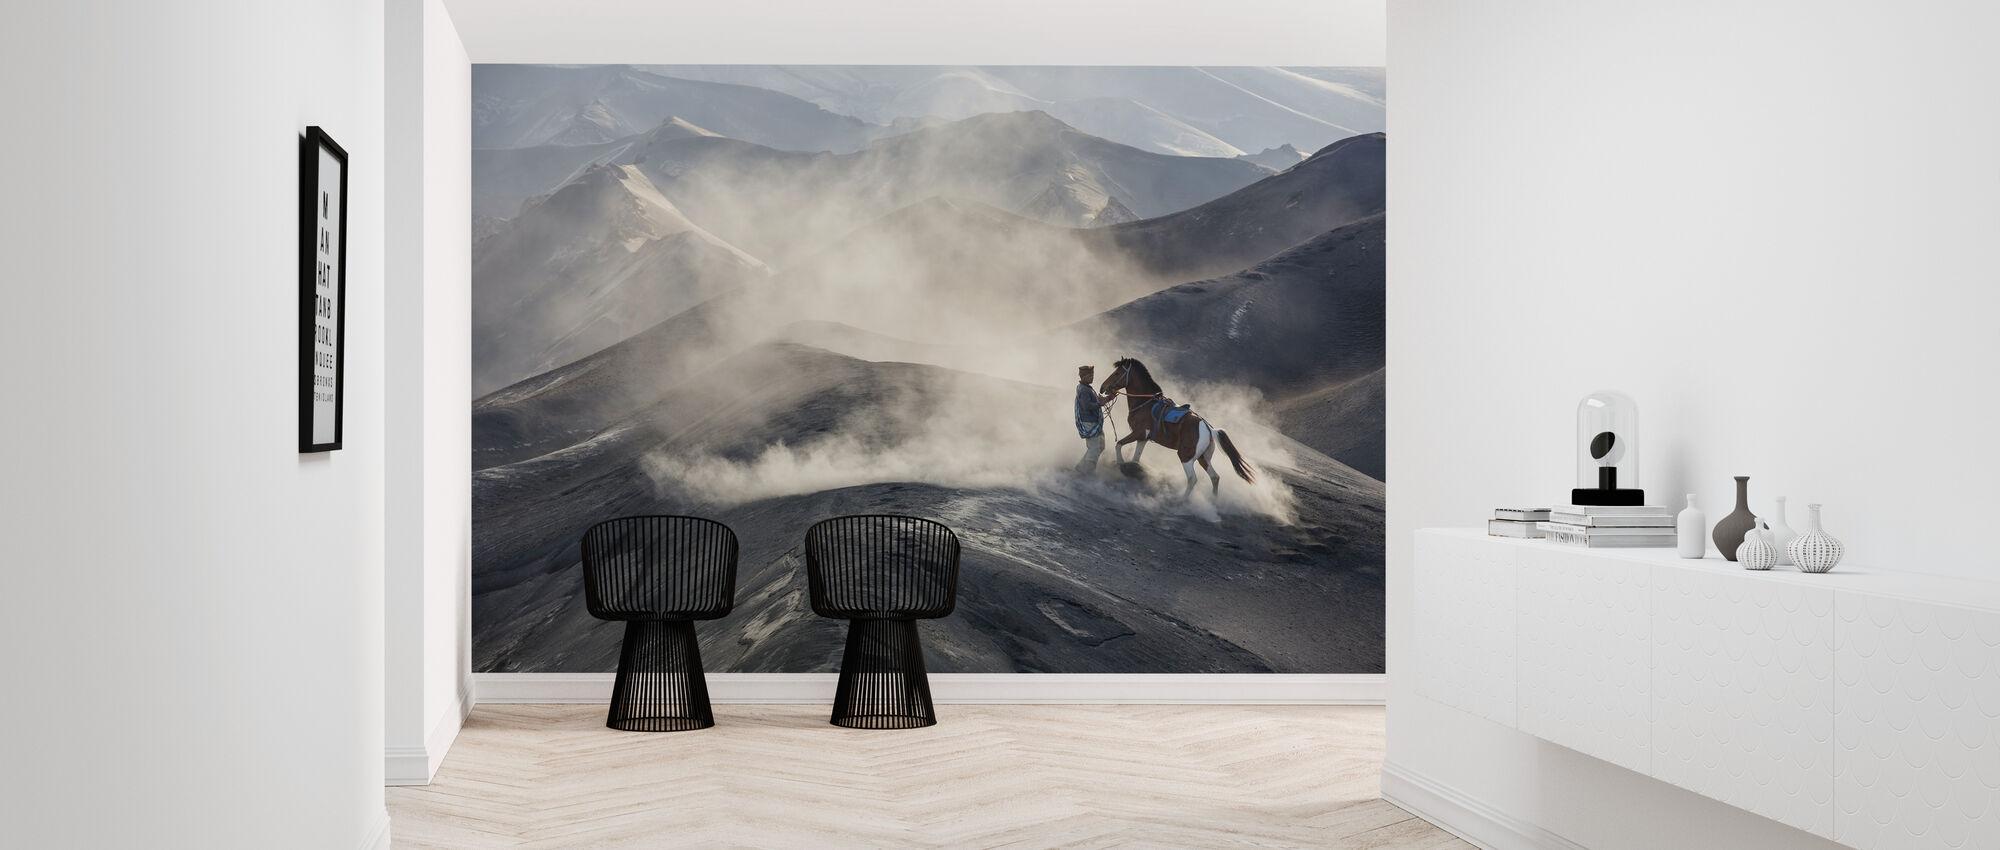 The Horseman - Wallpaper - Hallway